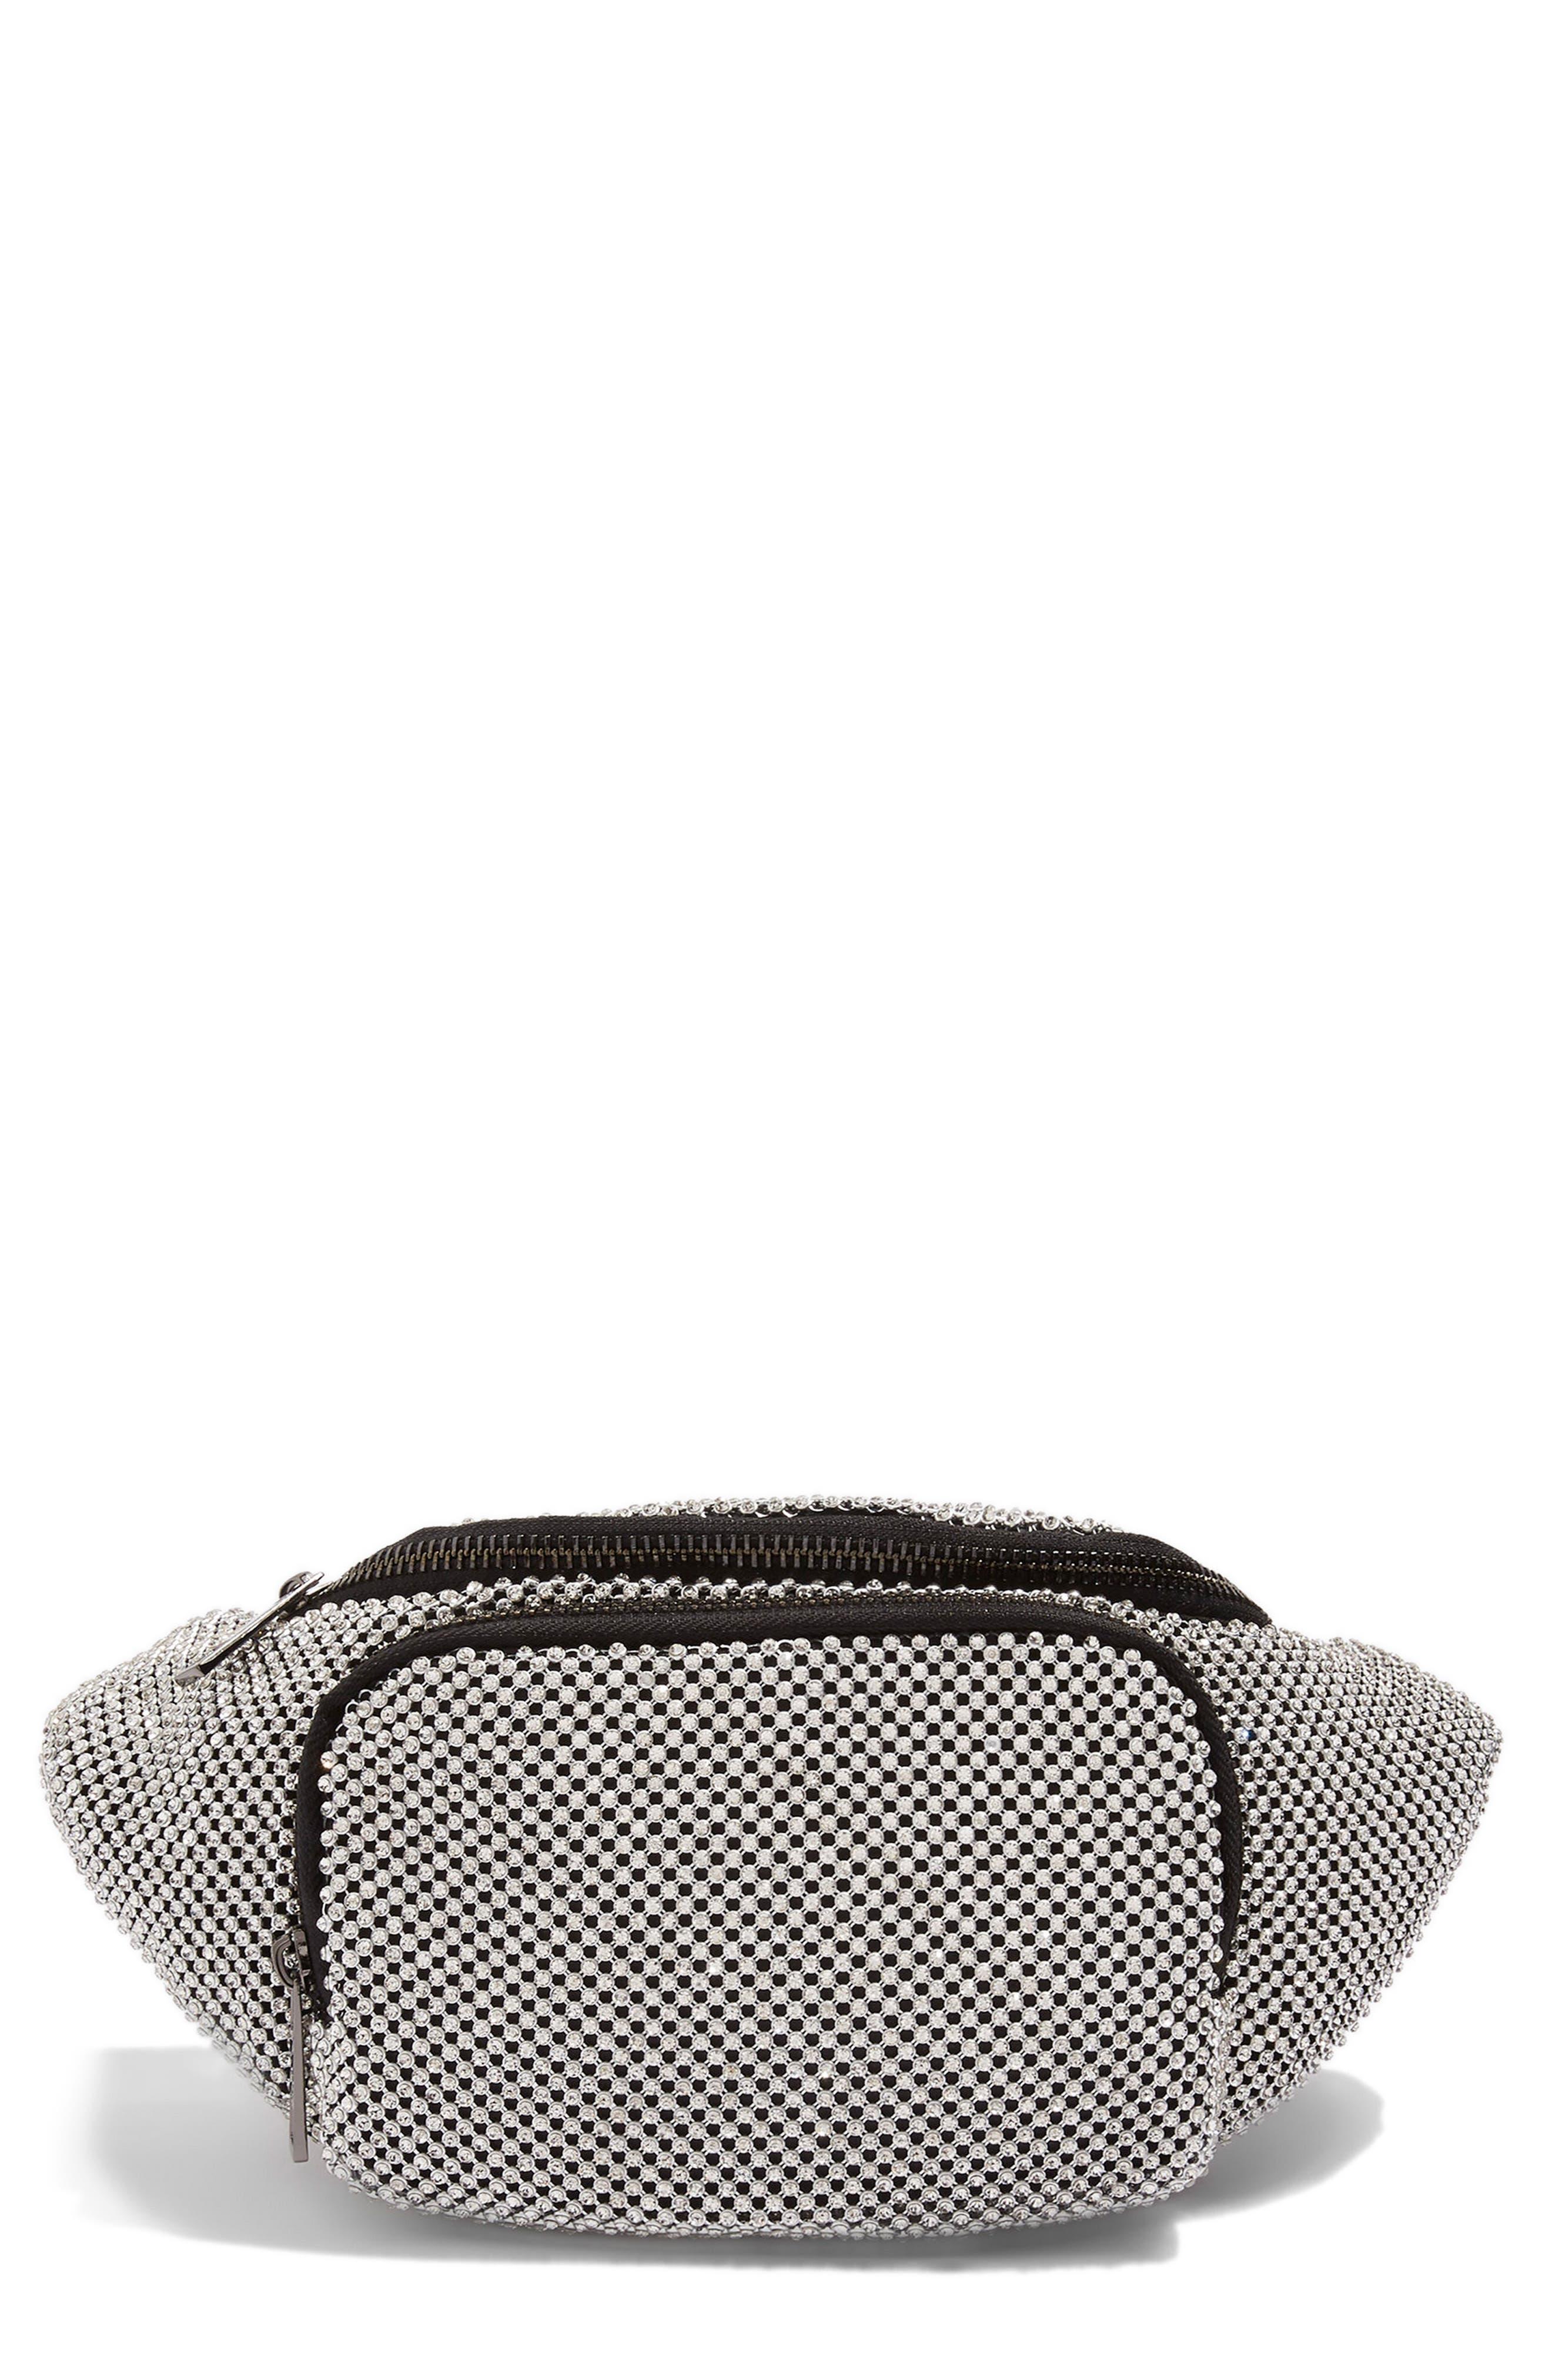 Diana Diamante Chainmail Bum Bag,                         Main,                         color,